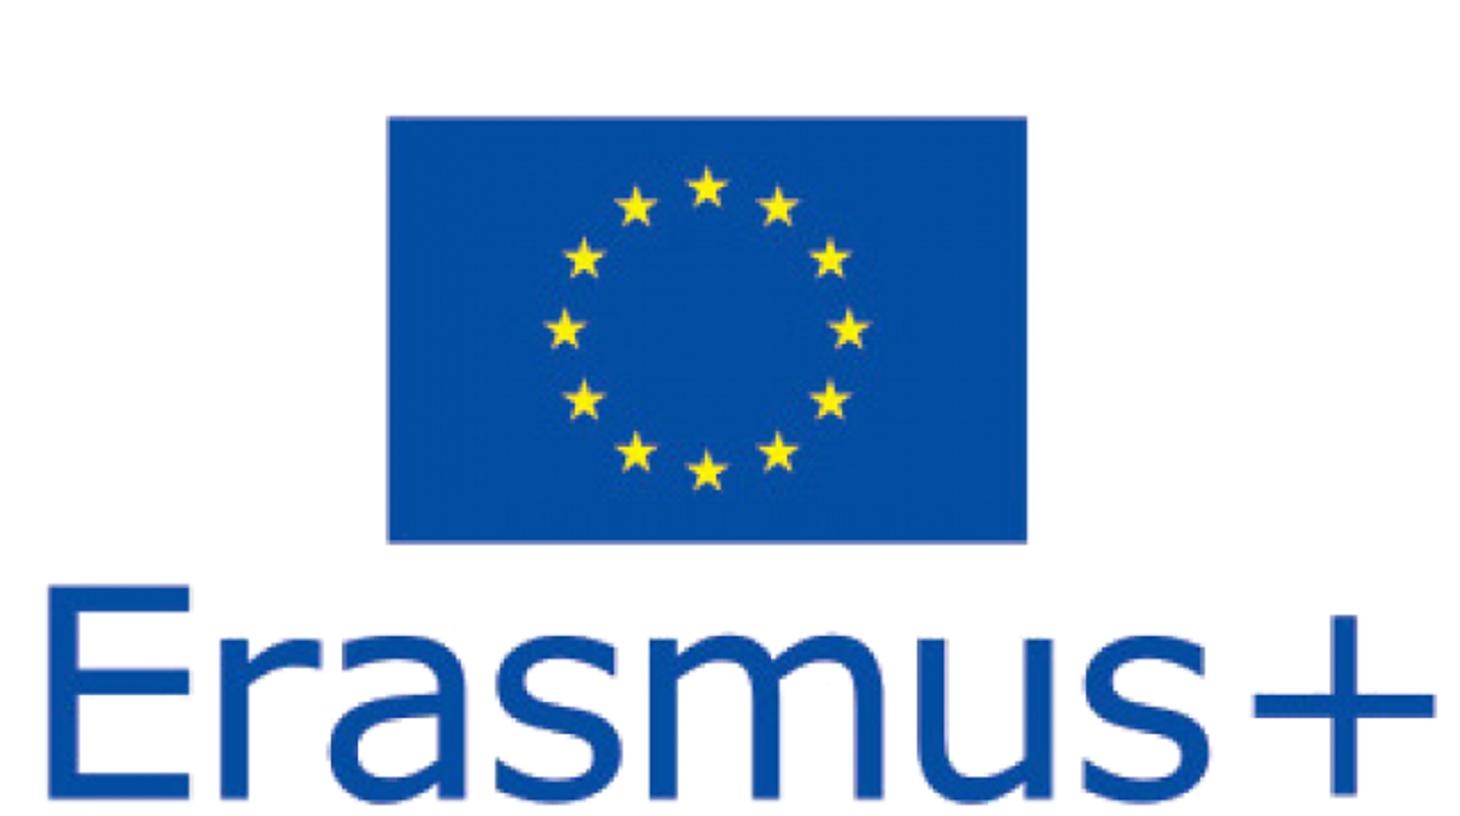 logo erasmus+ de l'union européenne